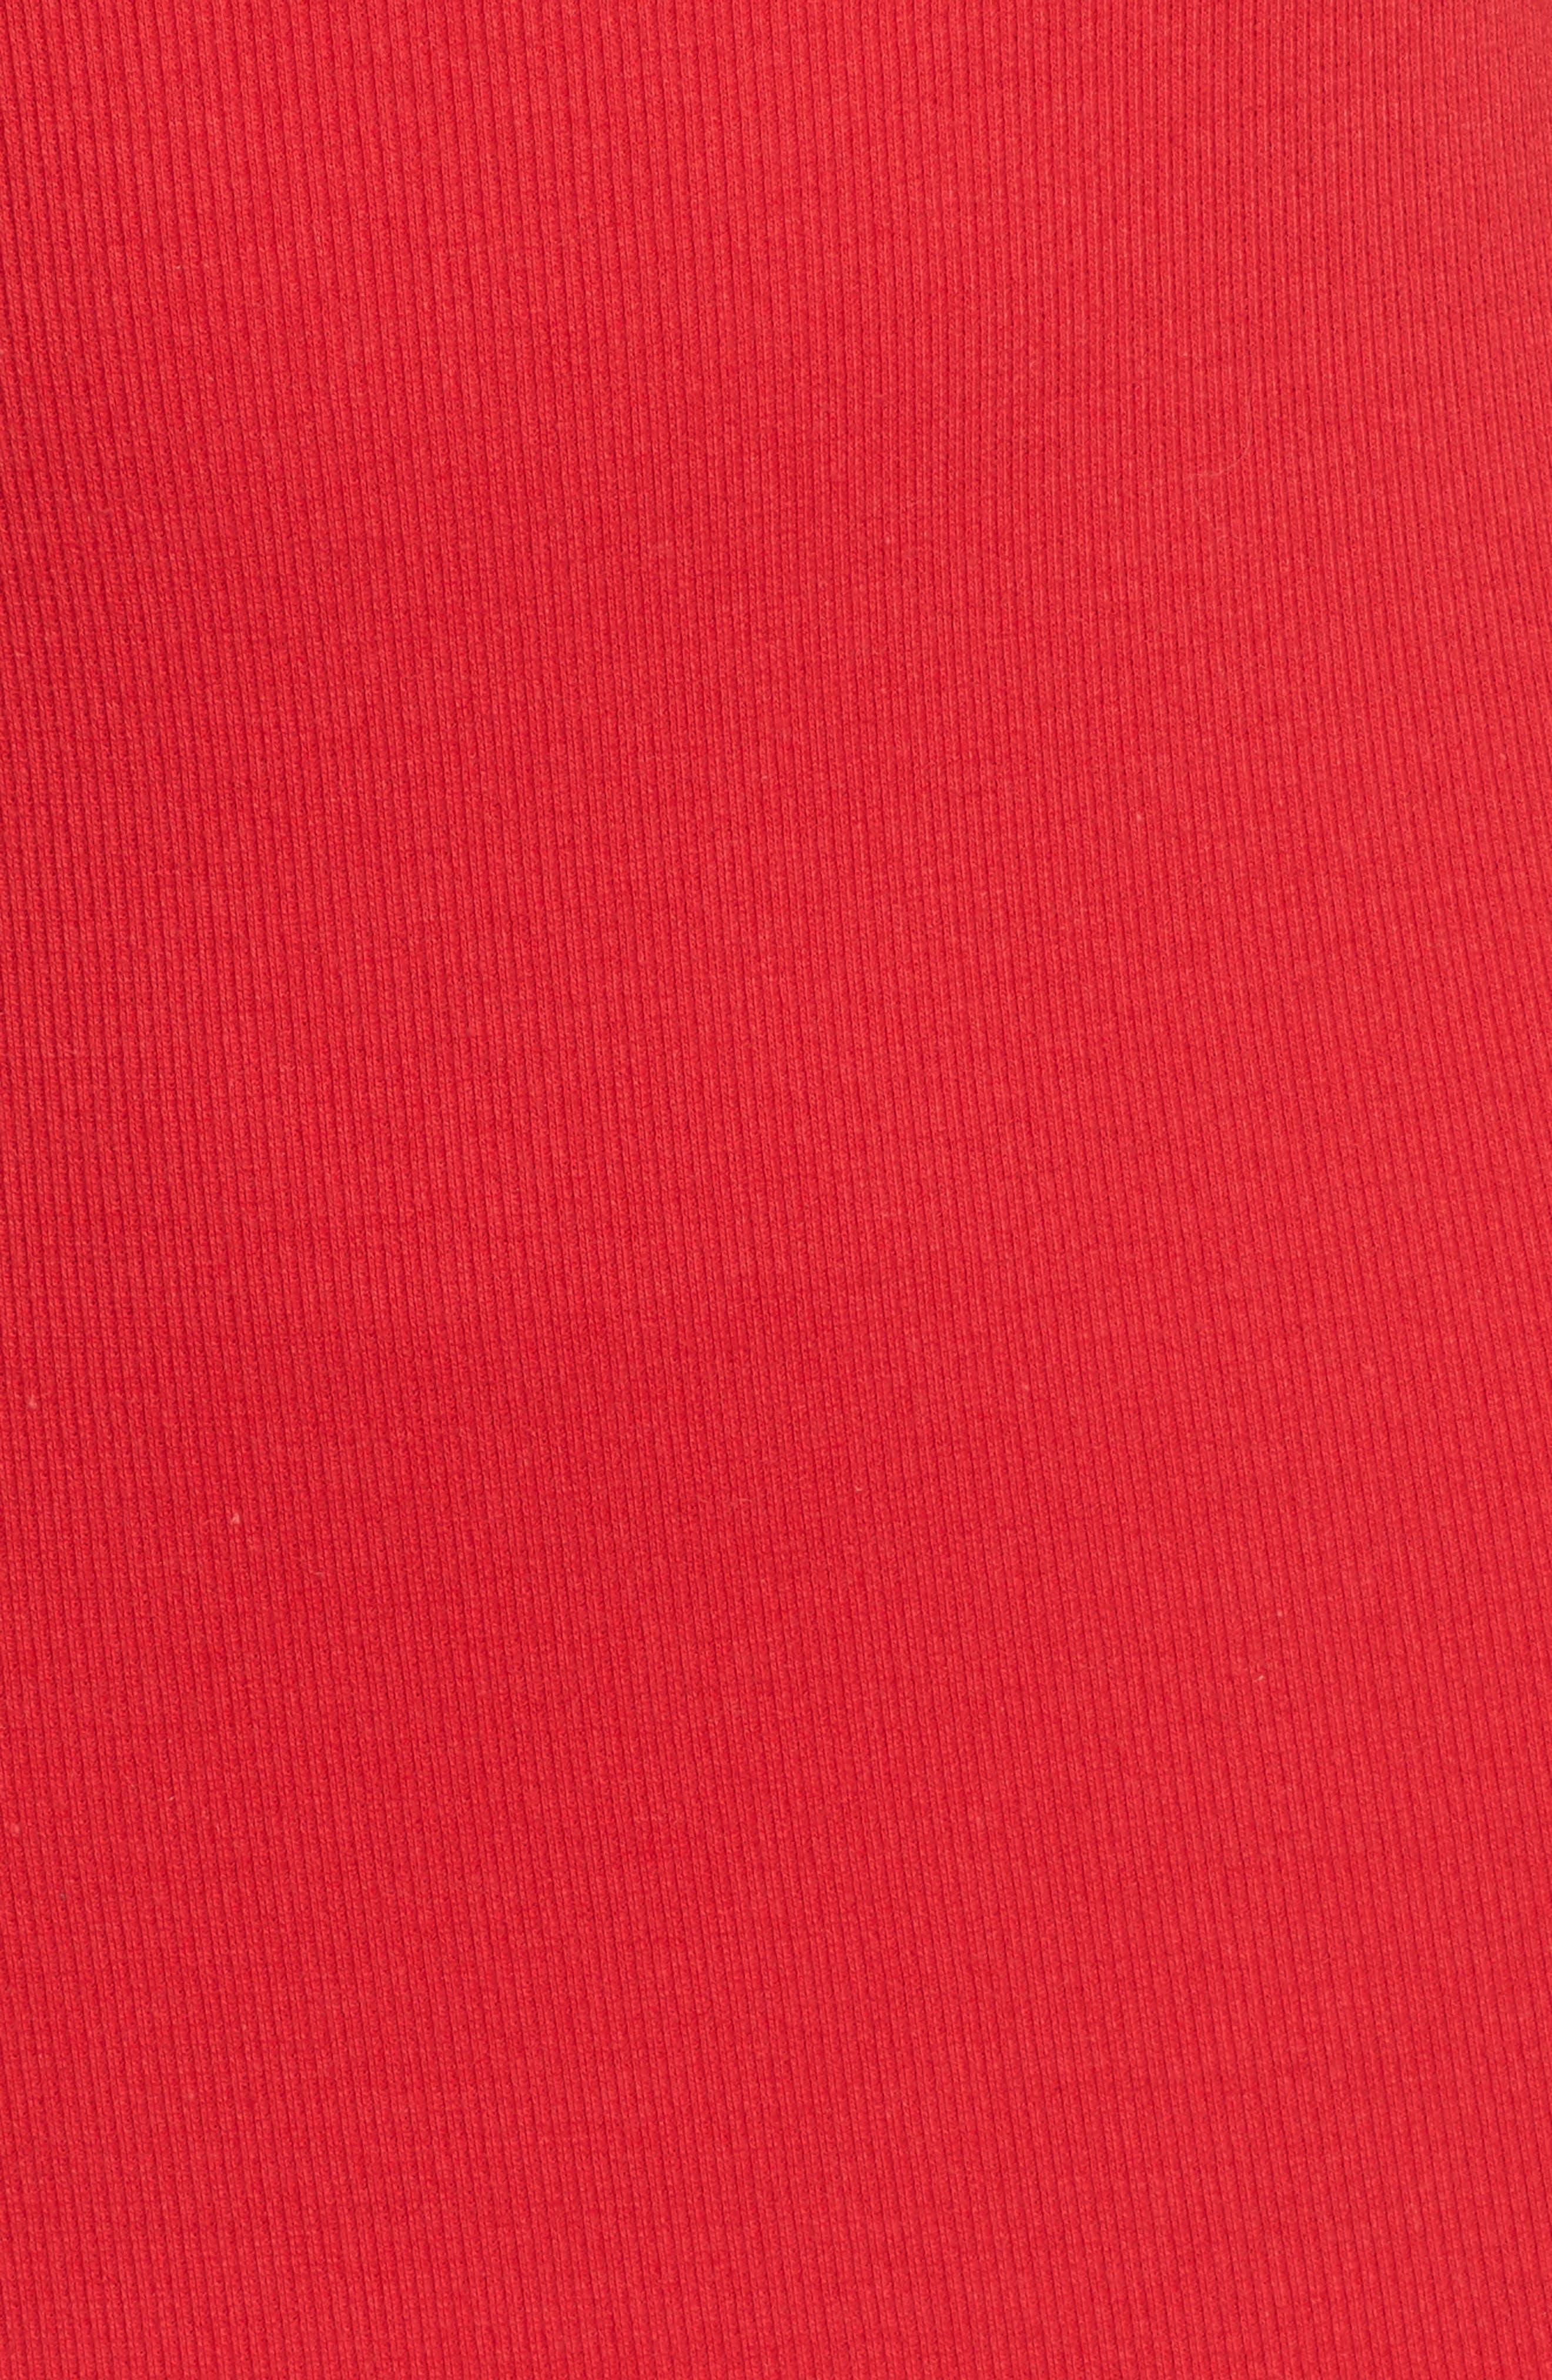 Cutout Dress,                             Alternate thumbnail 6, color,                             Red